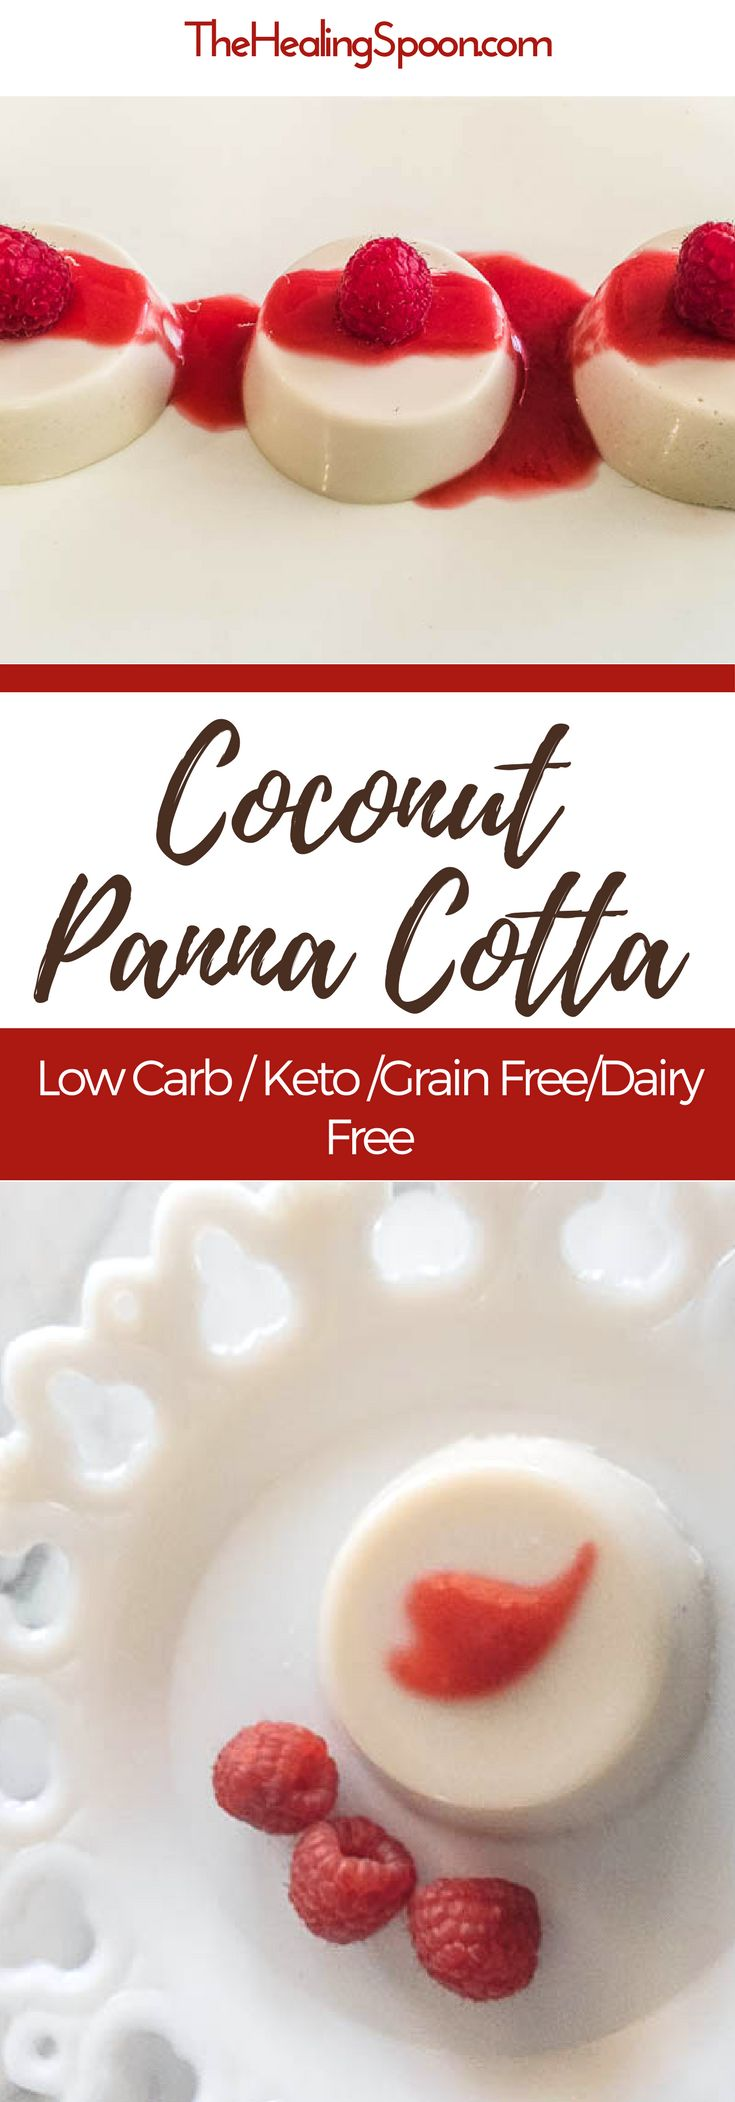 #paleo #ketorecipes dessert. Easy and fun to make. Vegetarian option included.